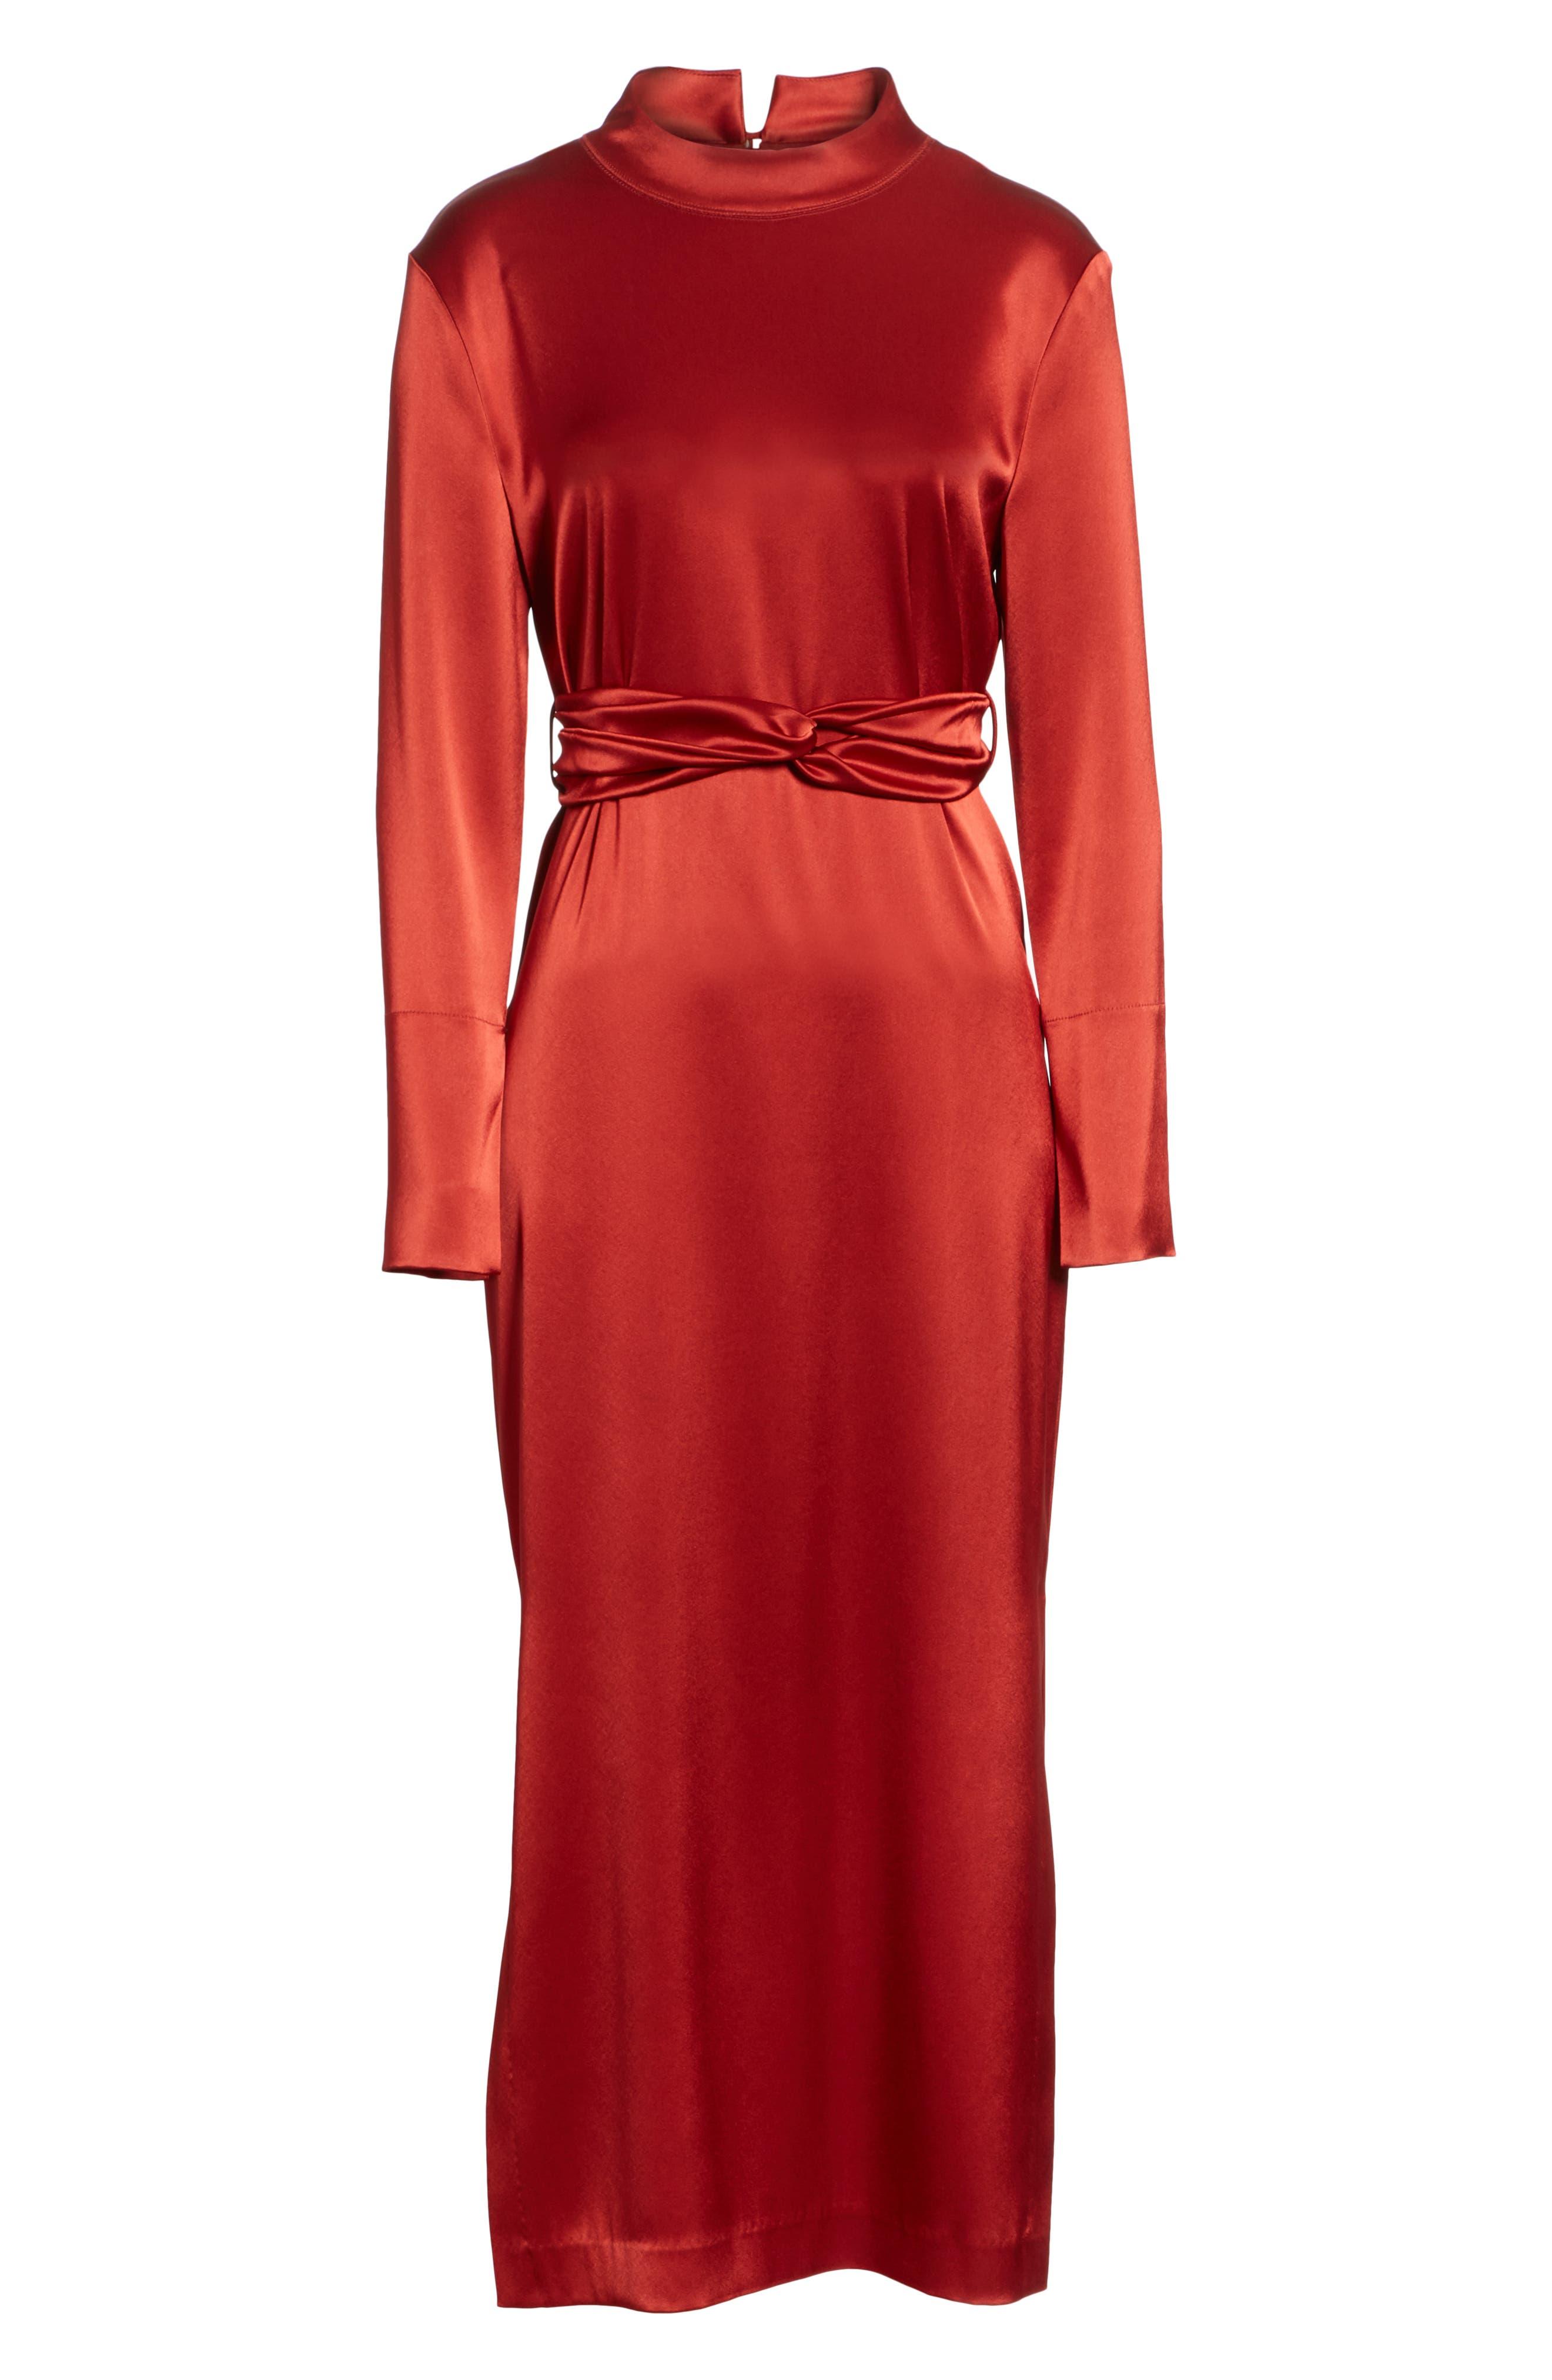 Sadie Belted Satin Dress,                             Alternate thumbnail 6, color,                             640